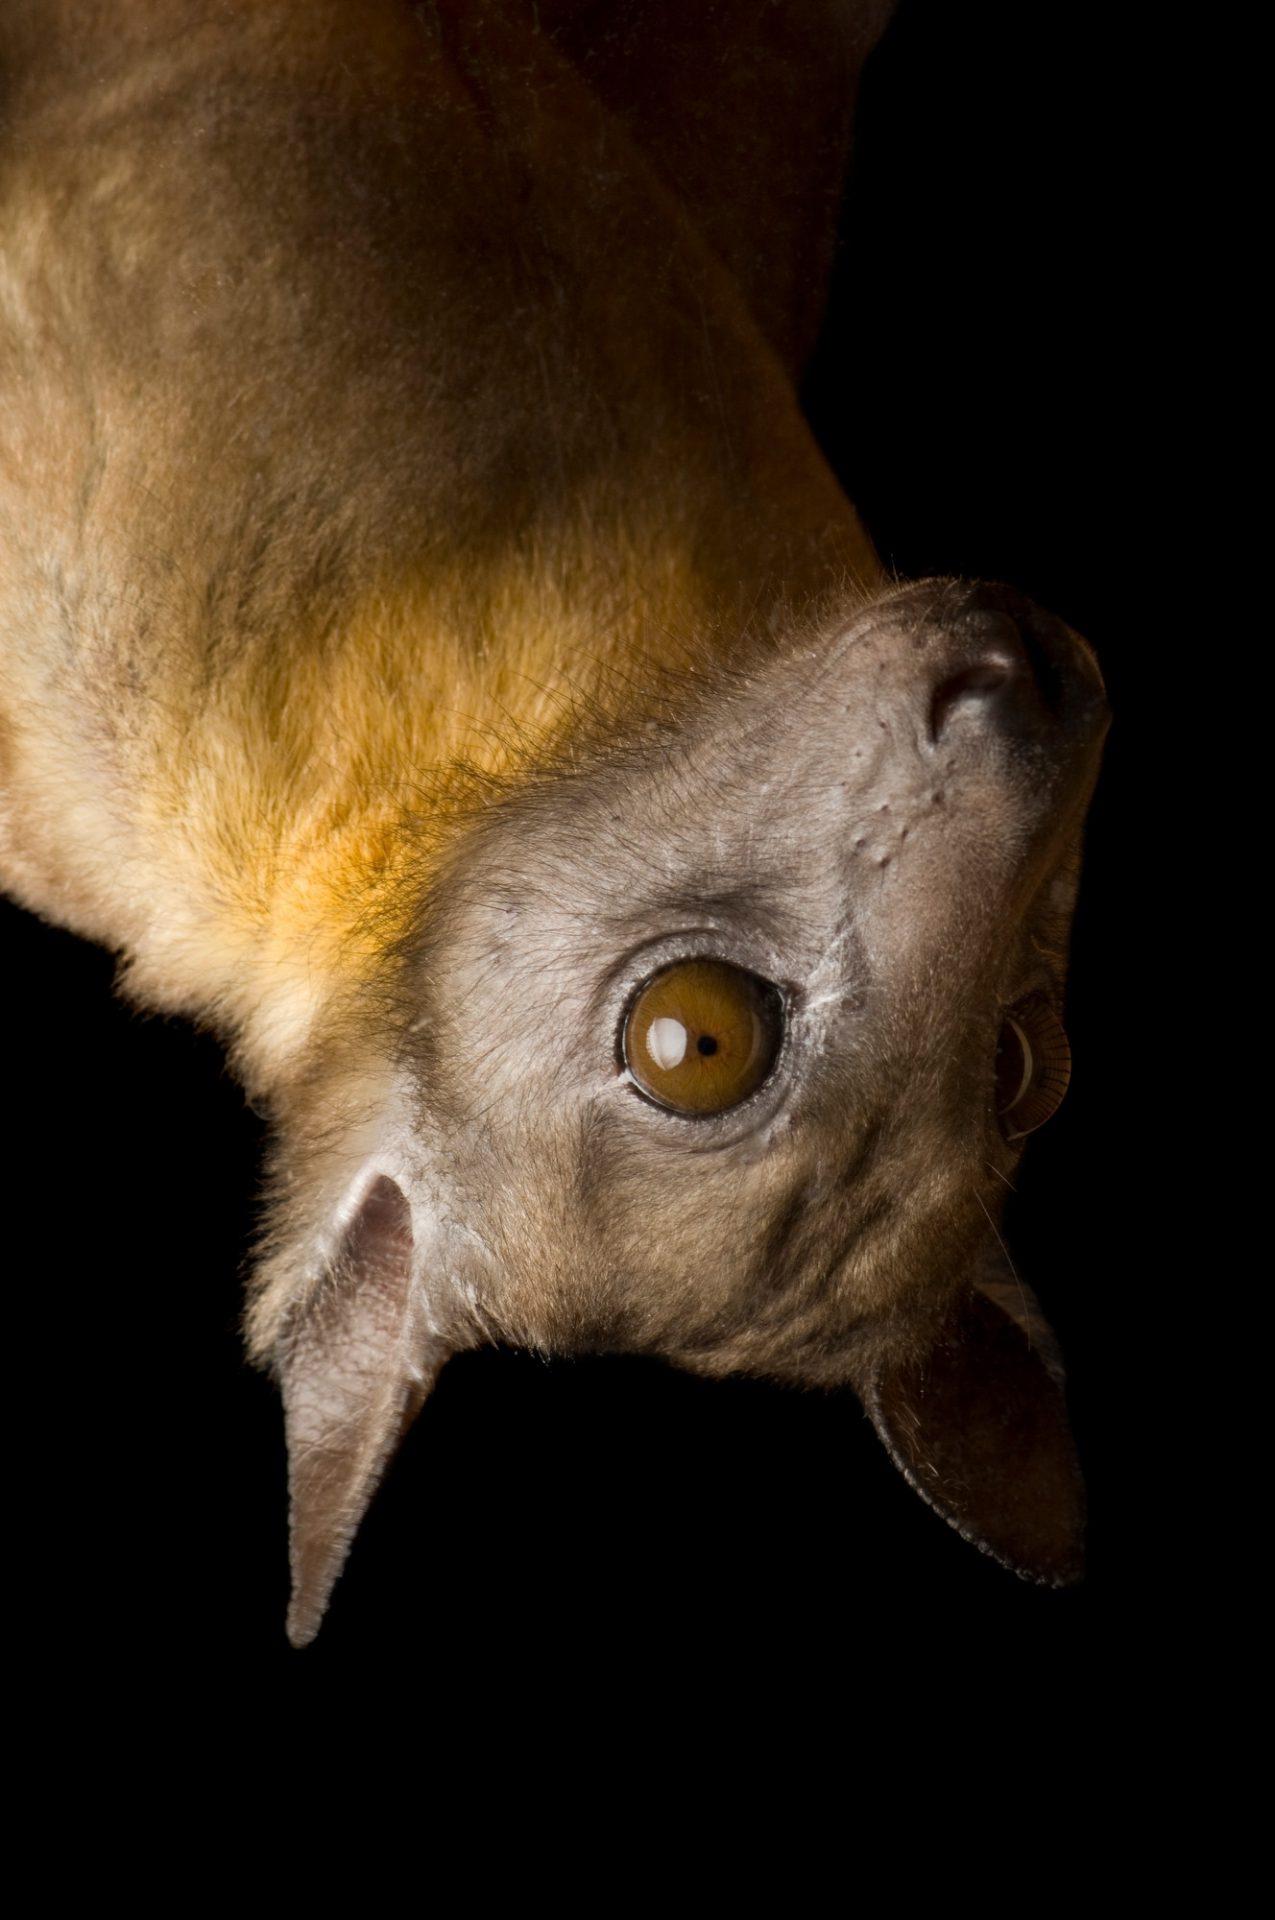 Photo: A straw-colored fruit bat (Eidolon helvum) at the Tulsa Zoo, Tulsa, Oklahoma.